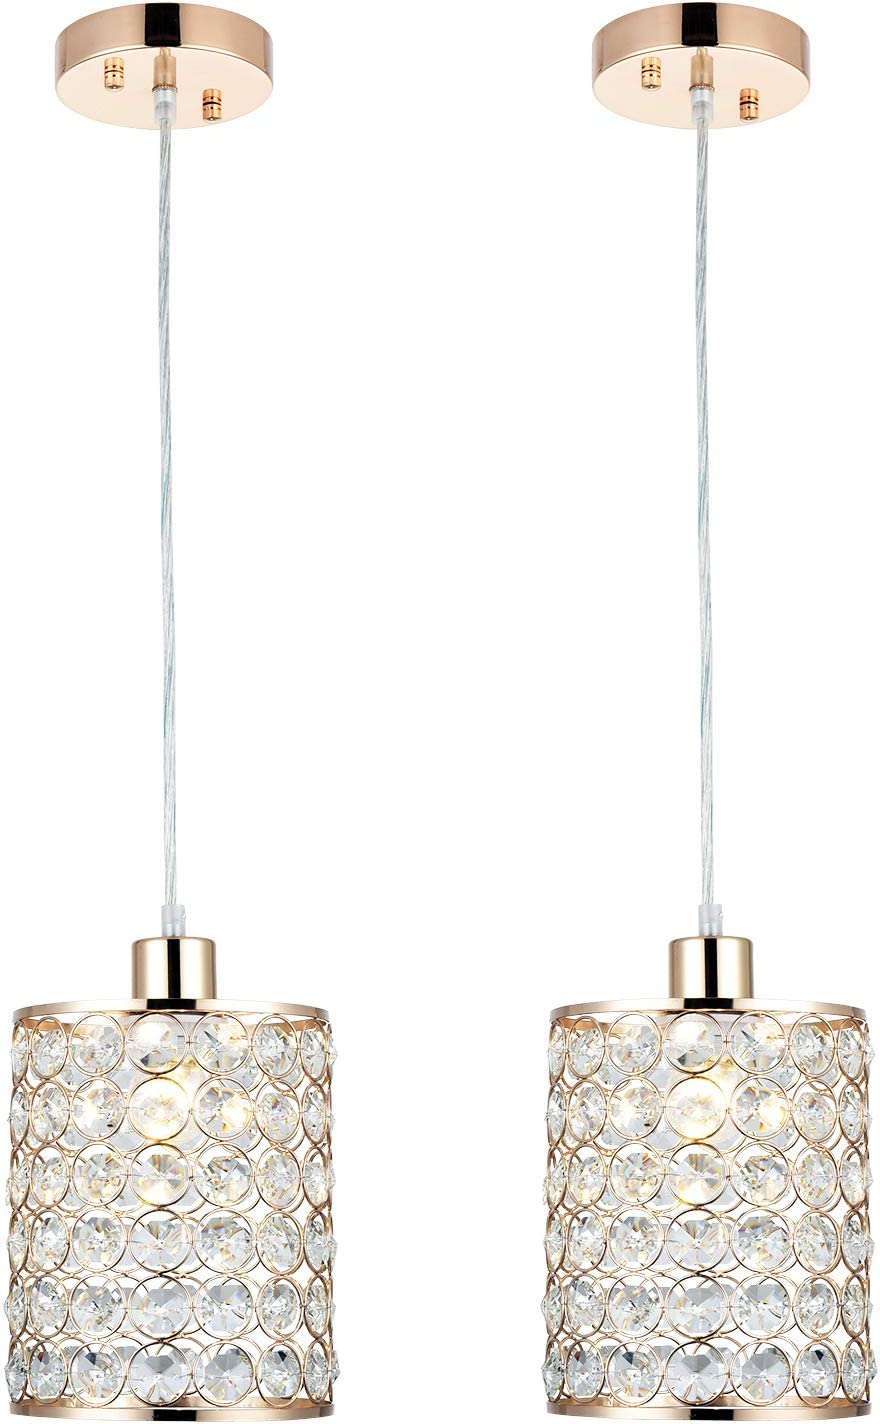 MonDaufie 2 Popularity Pack Gold Chandelier Light It is very popular Adjustab Pendant Crystal